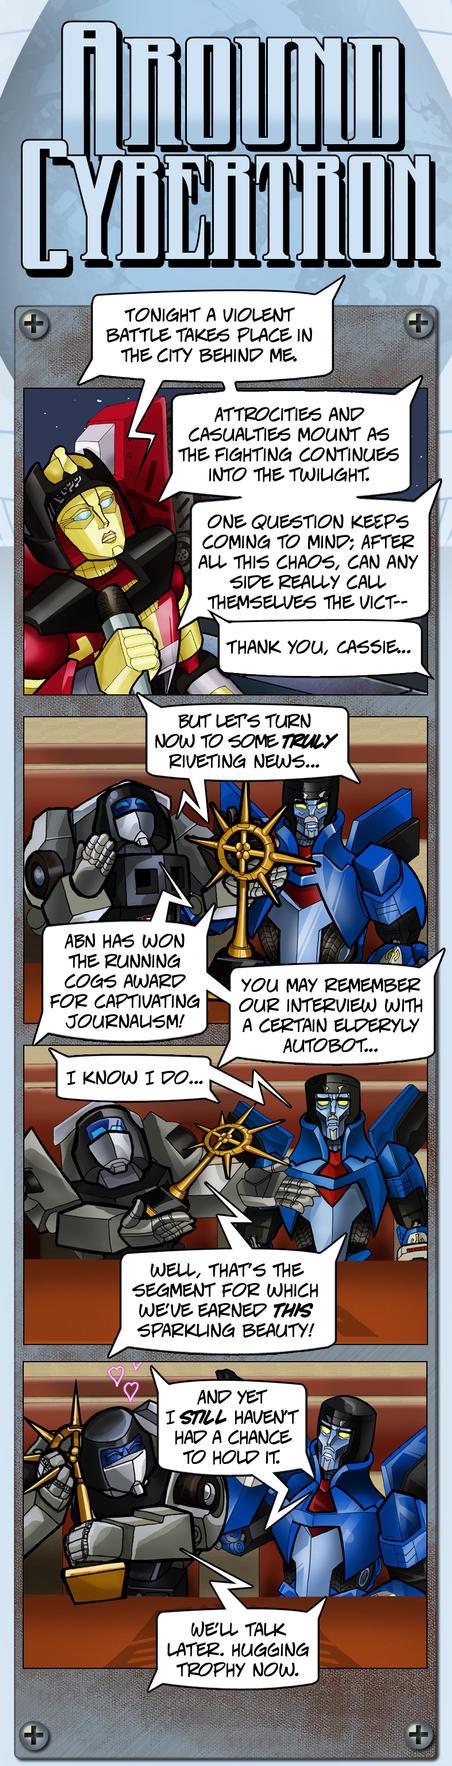 Around Cybertron Part 17 by RID-NightViper